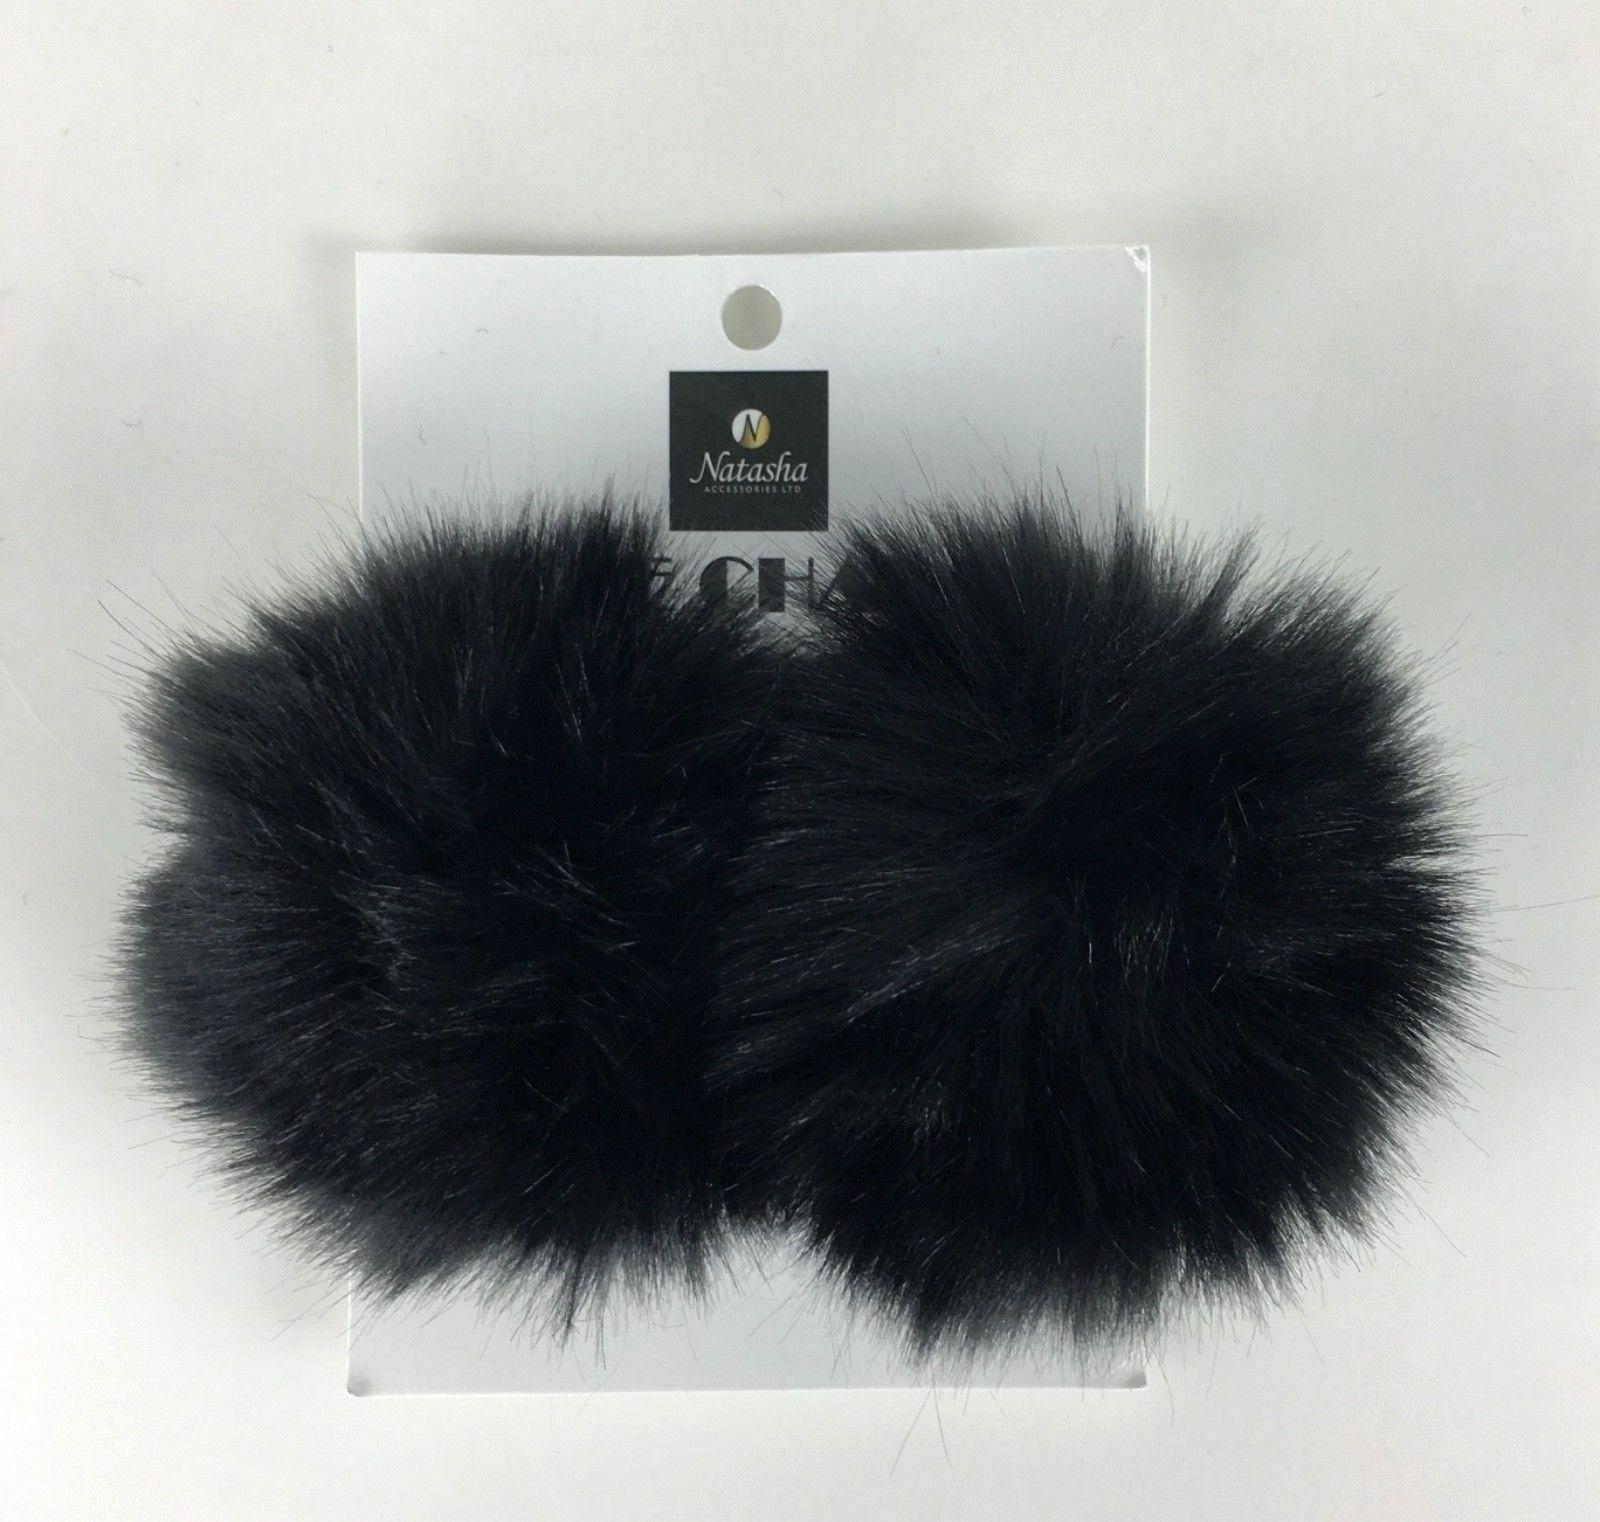 New 2 Black Shoe Accessories Charms Pom Poms Natasha Hair Shoe Accessory